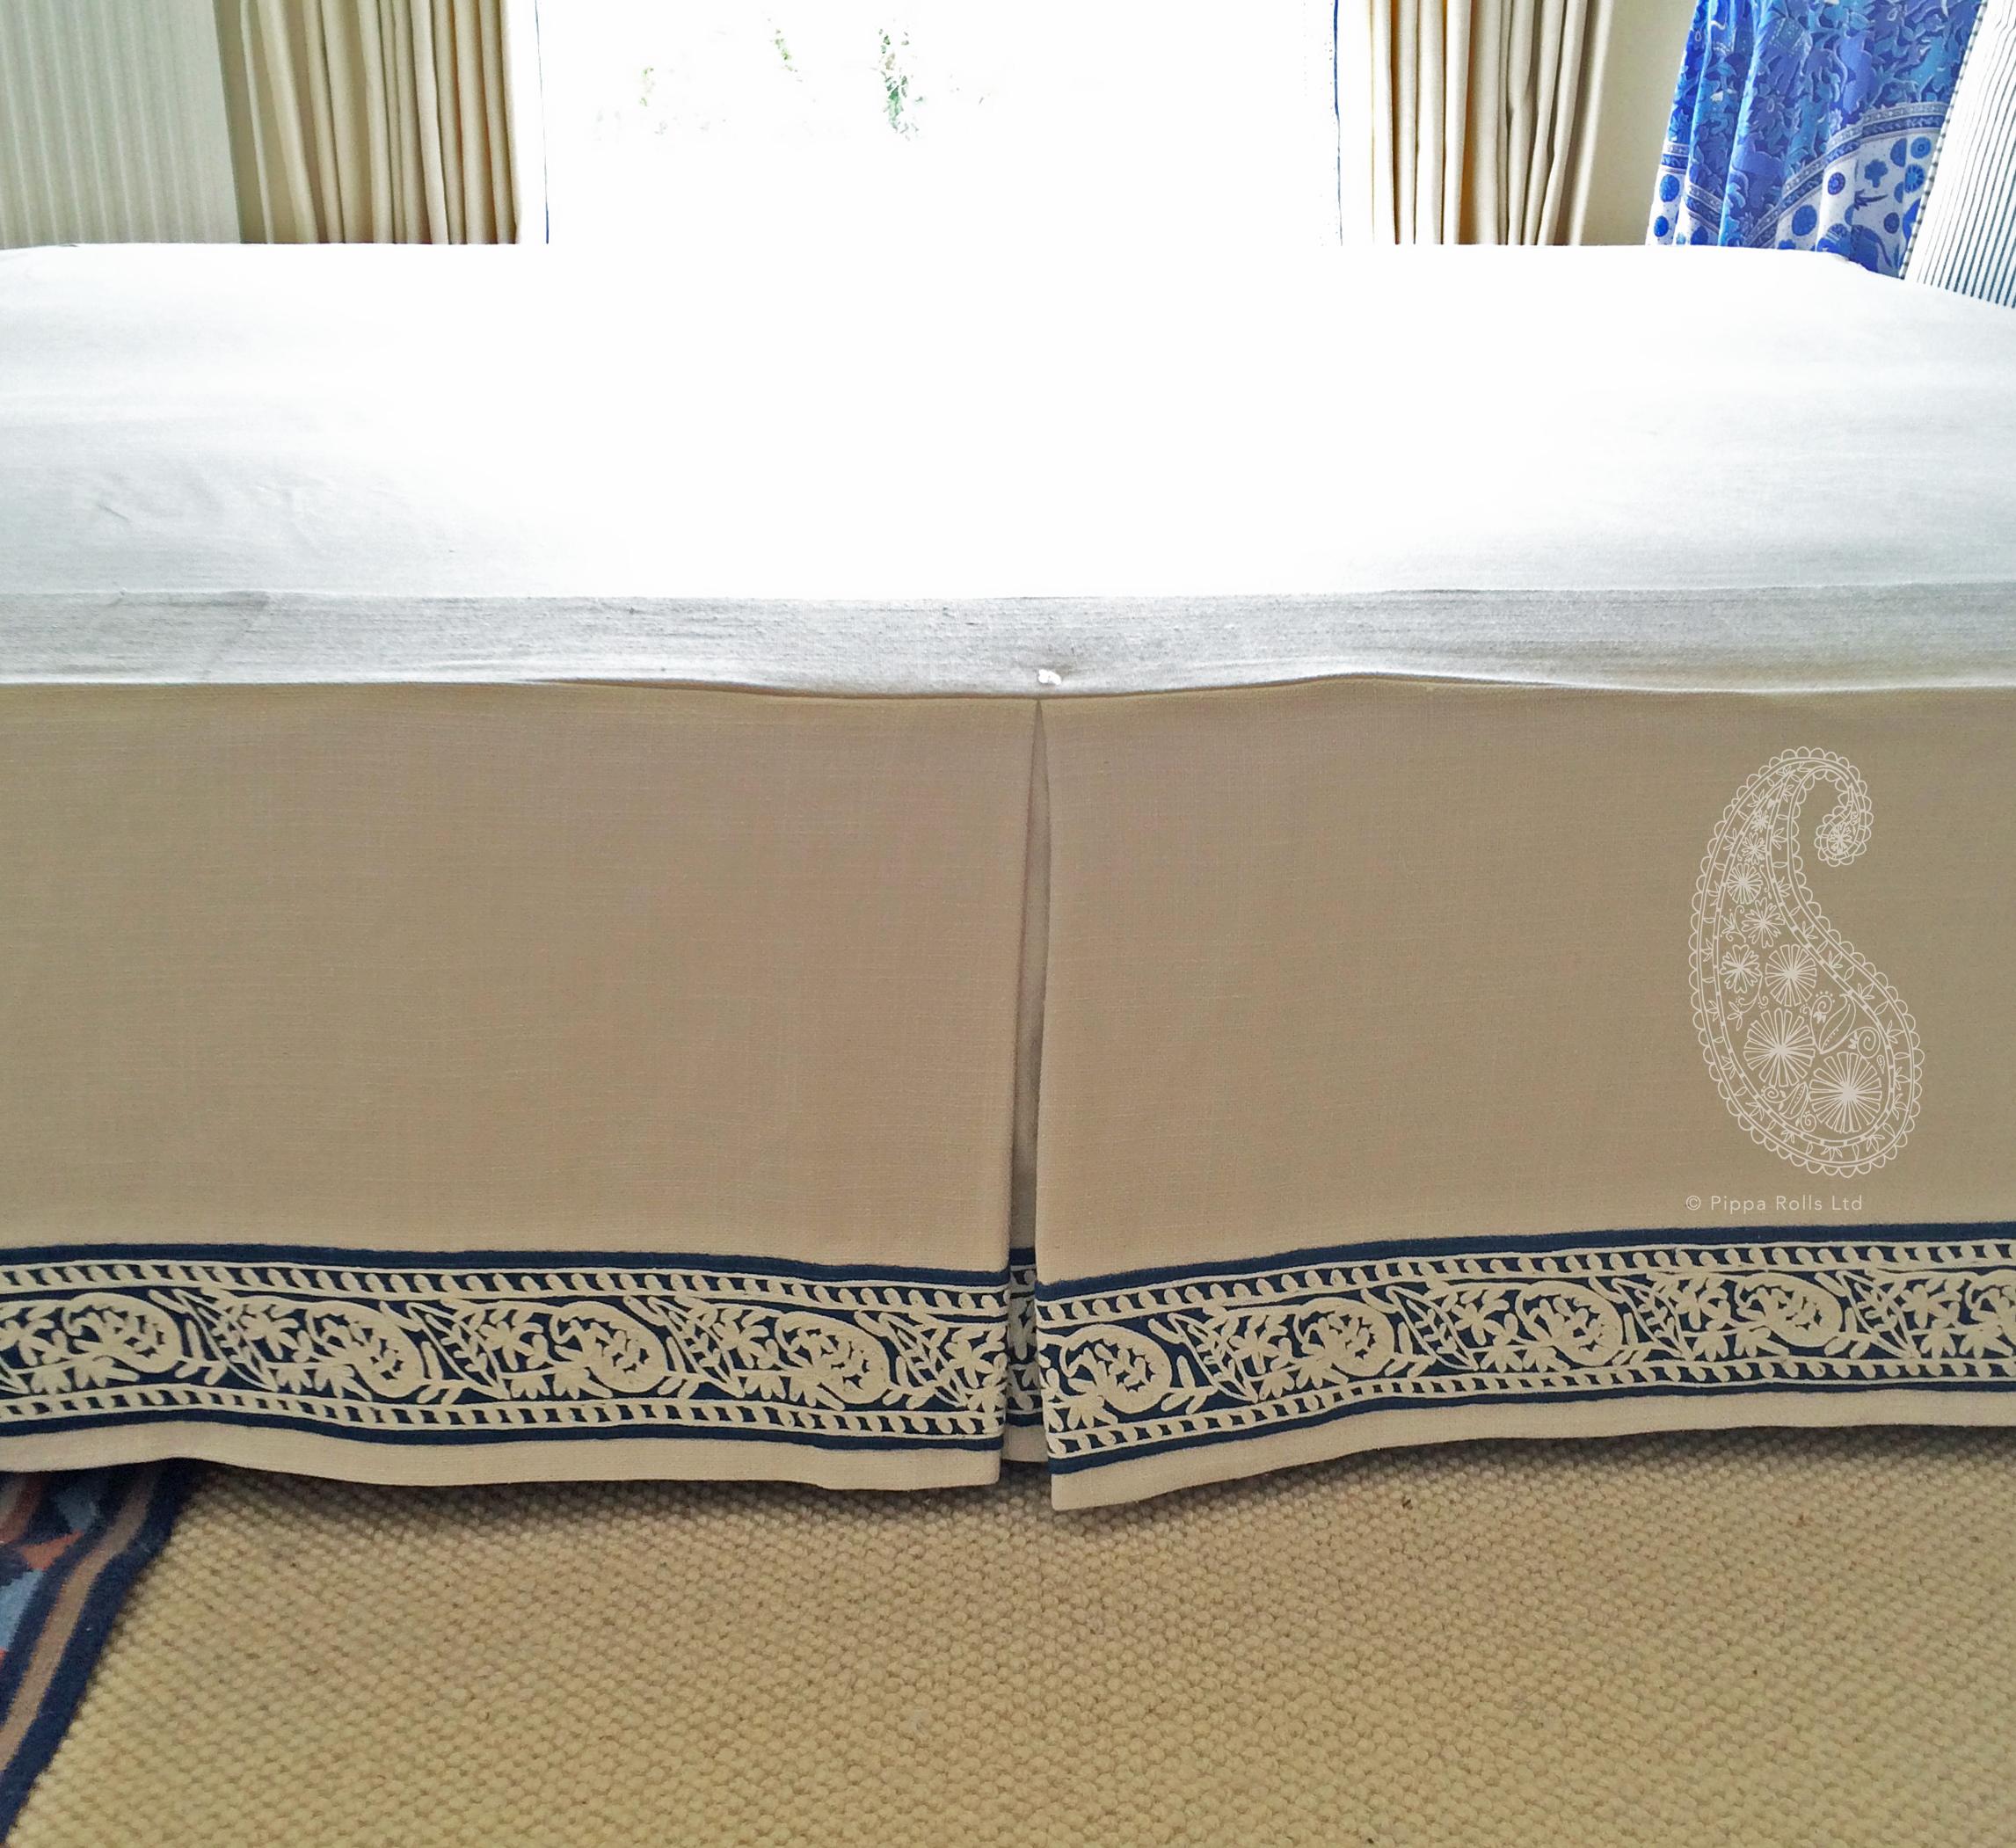 bed valance Pippa Rolls Limited jpeg.jpg